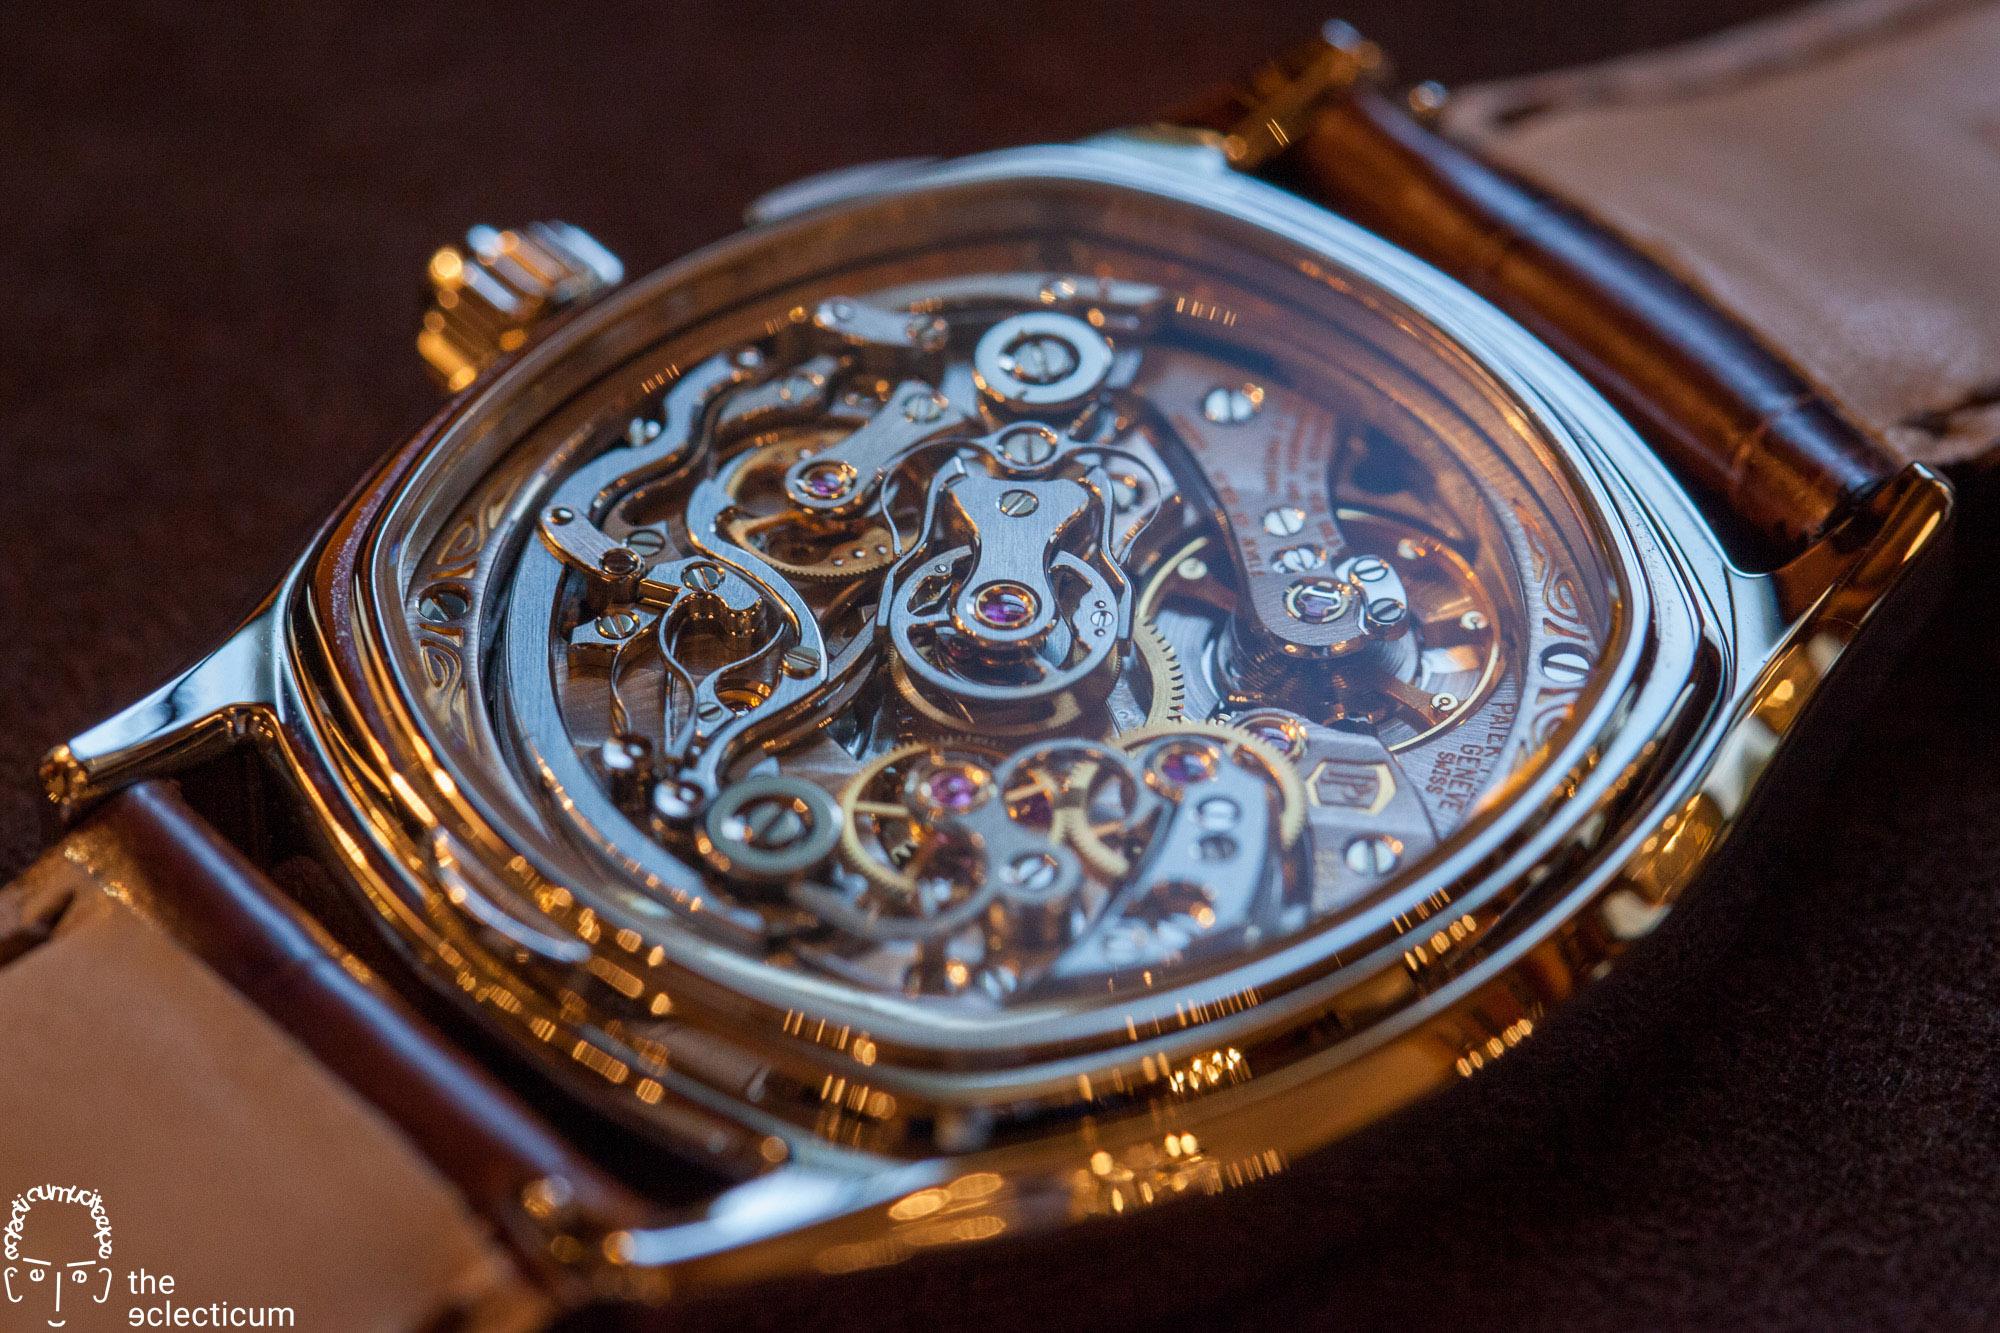 Patek Philippe Split seconds chronograph rattrapante 5950 monopusher CHR 27-525PS